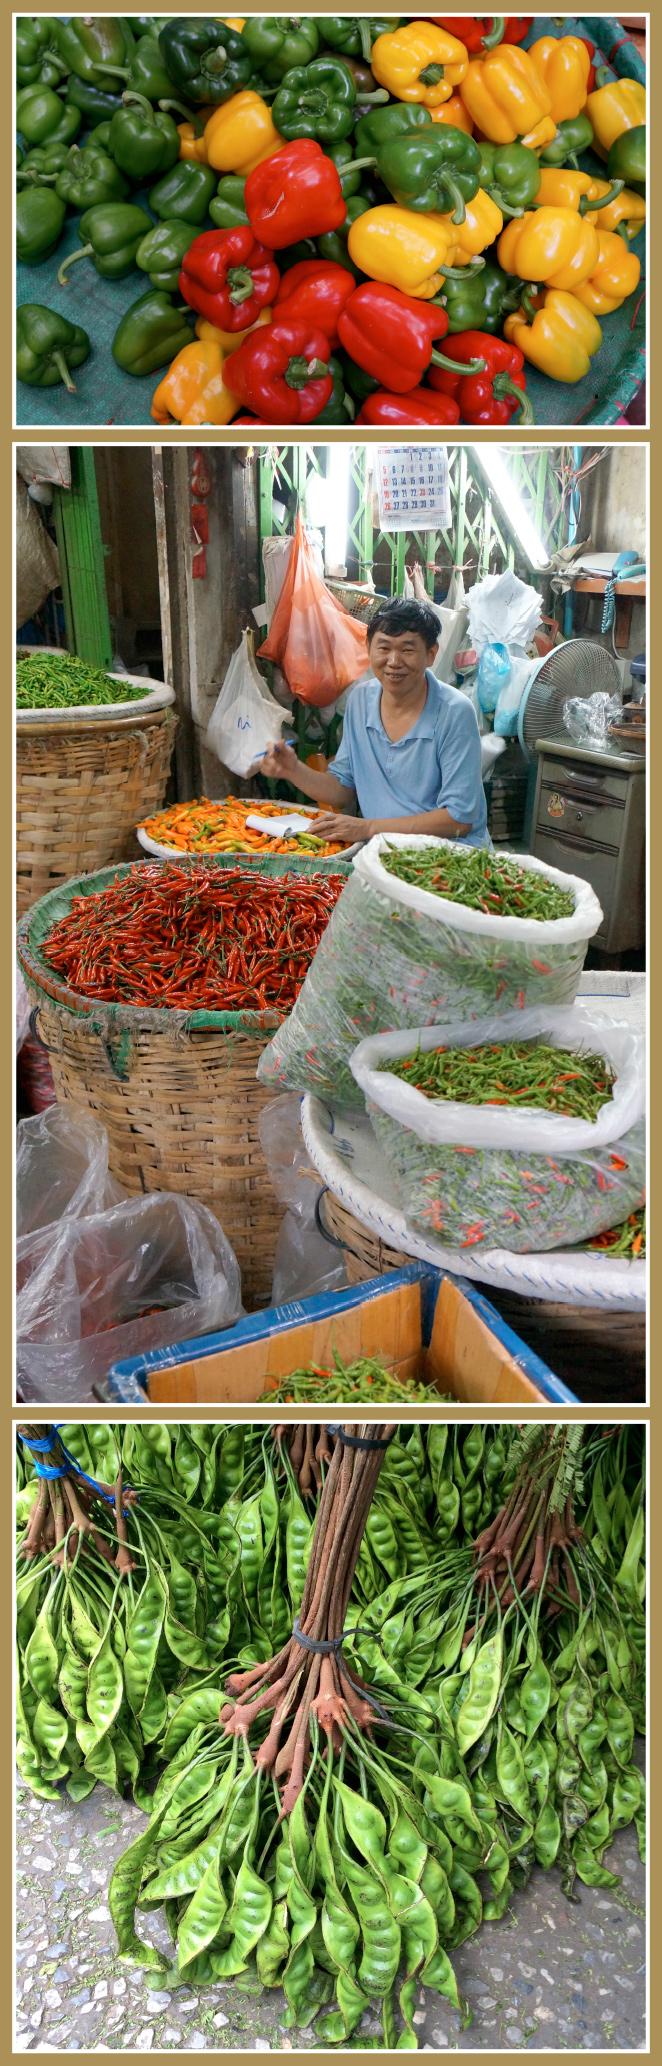 Mercado de Fruta y Verdura, Bangkok